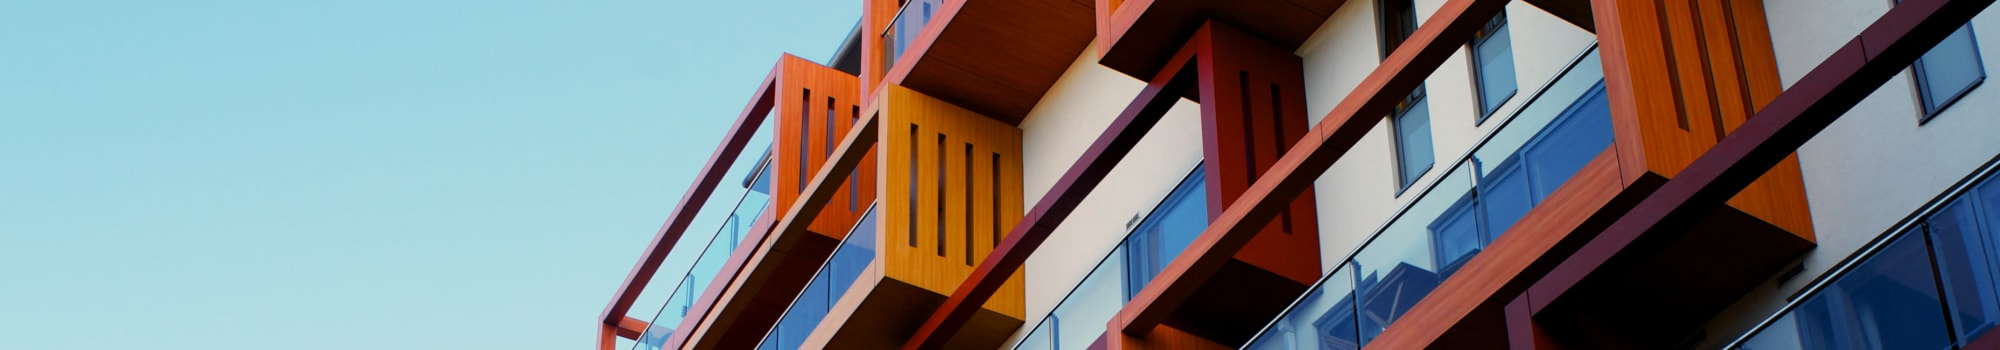 Maintenance Request of Stonegate Apartments in Pennington Gap, Virginia